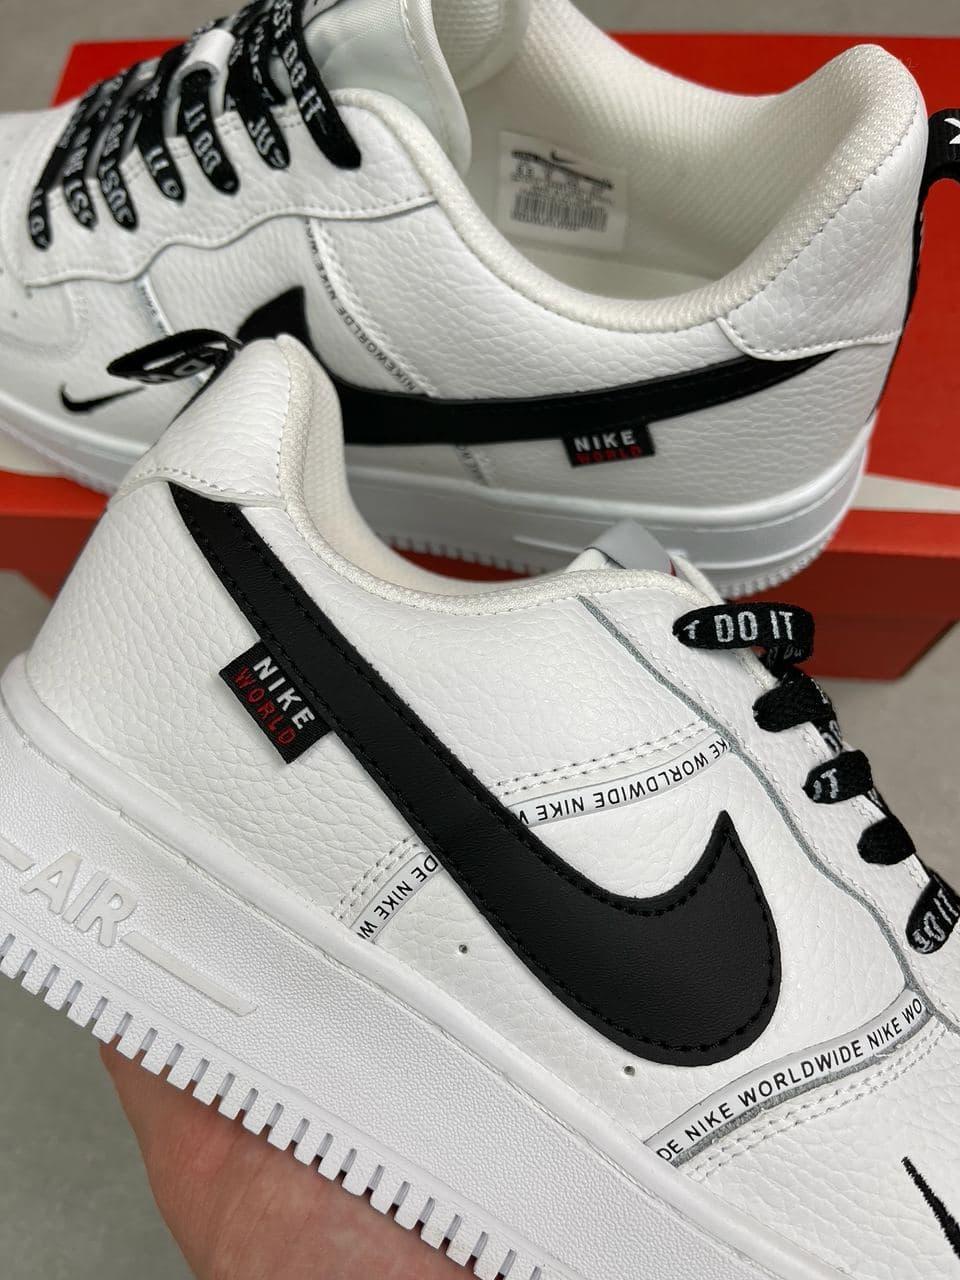 Мужские кроссовки Nike Air Force 1 Worldwide | All white/ black